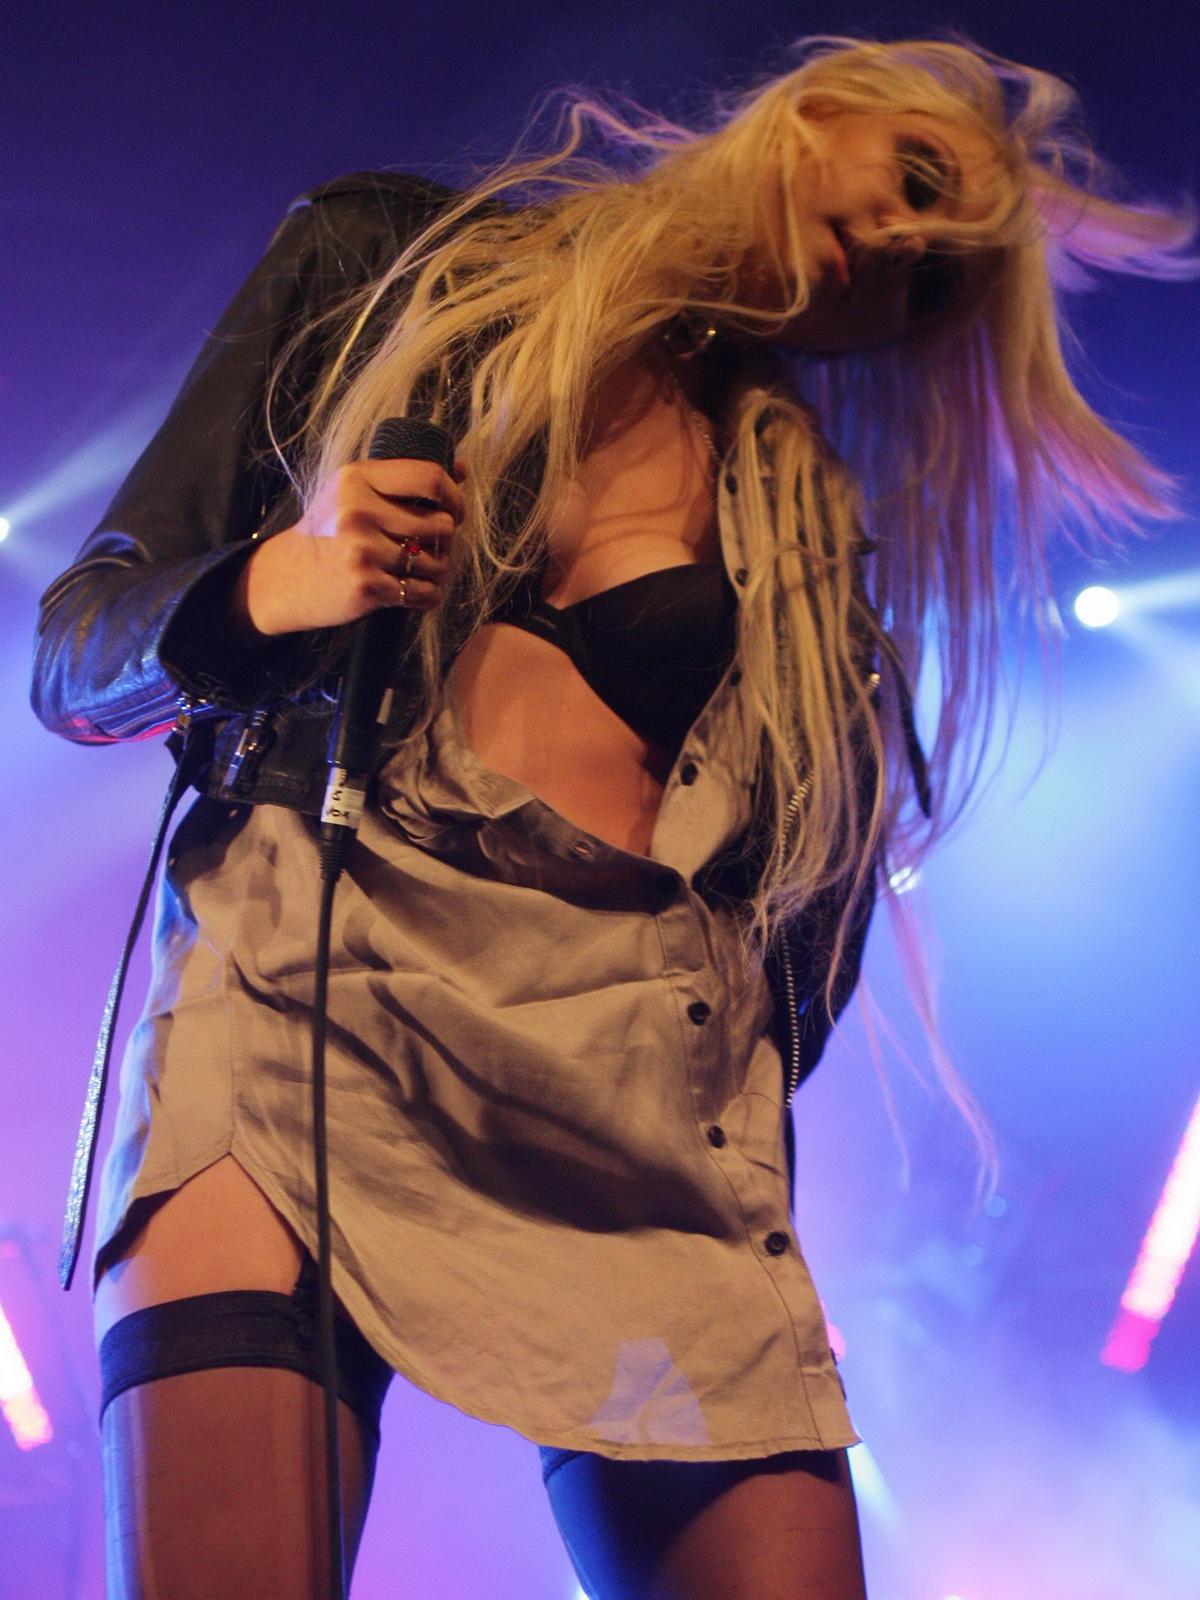 http://2.bp.blogspot.com/_NRGPIrDtEg8/TQswvcEzSXI/AAAAAAAAAbU/XXogHahkEnw/s1600/Taylor_Momsen_cleavage_6.jpg